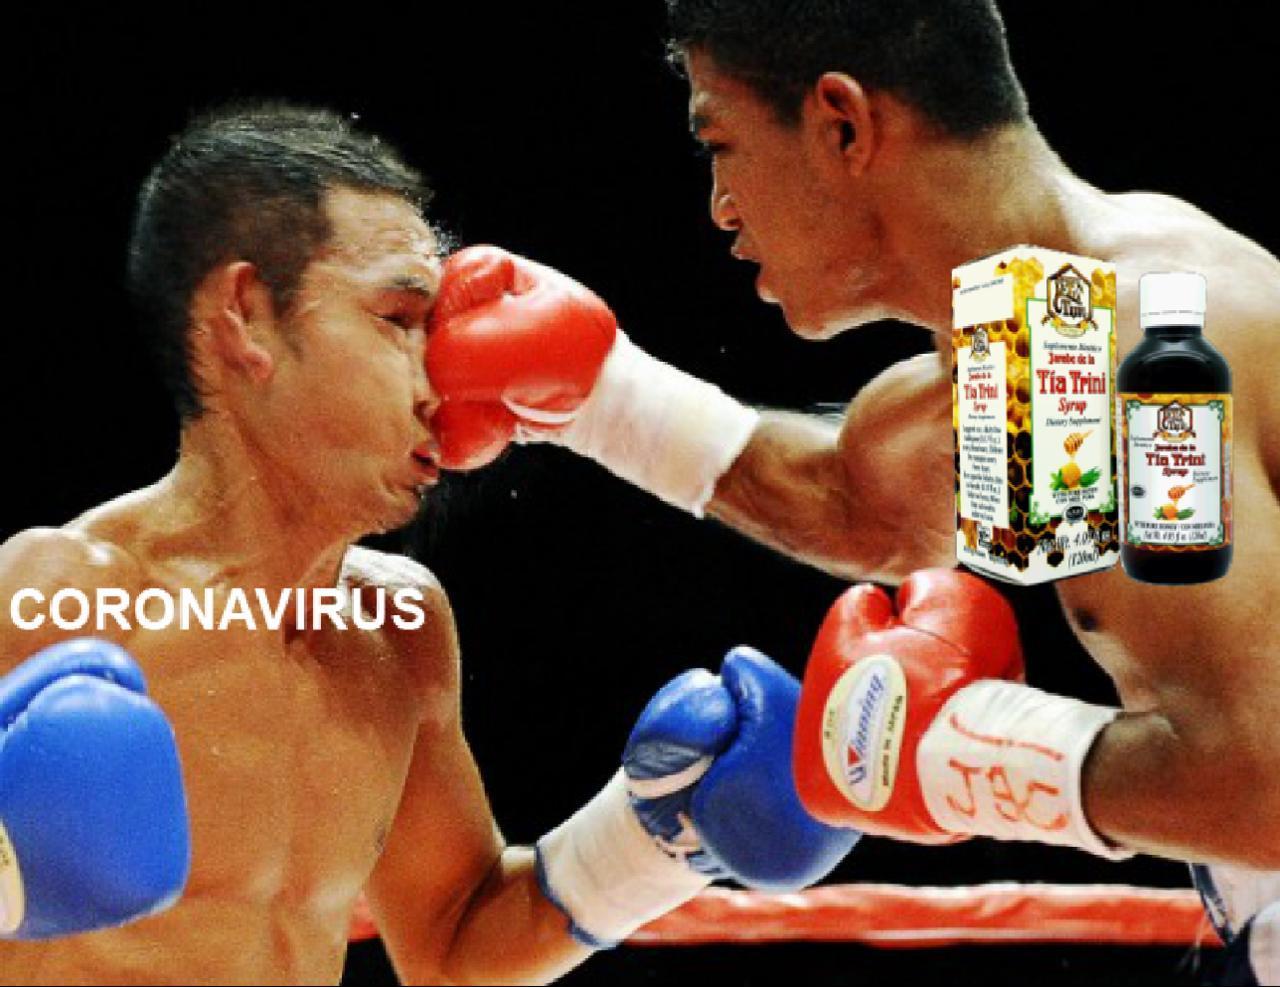 Coronavirus va Mexico - meme